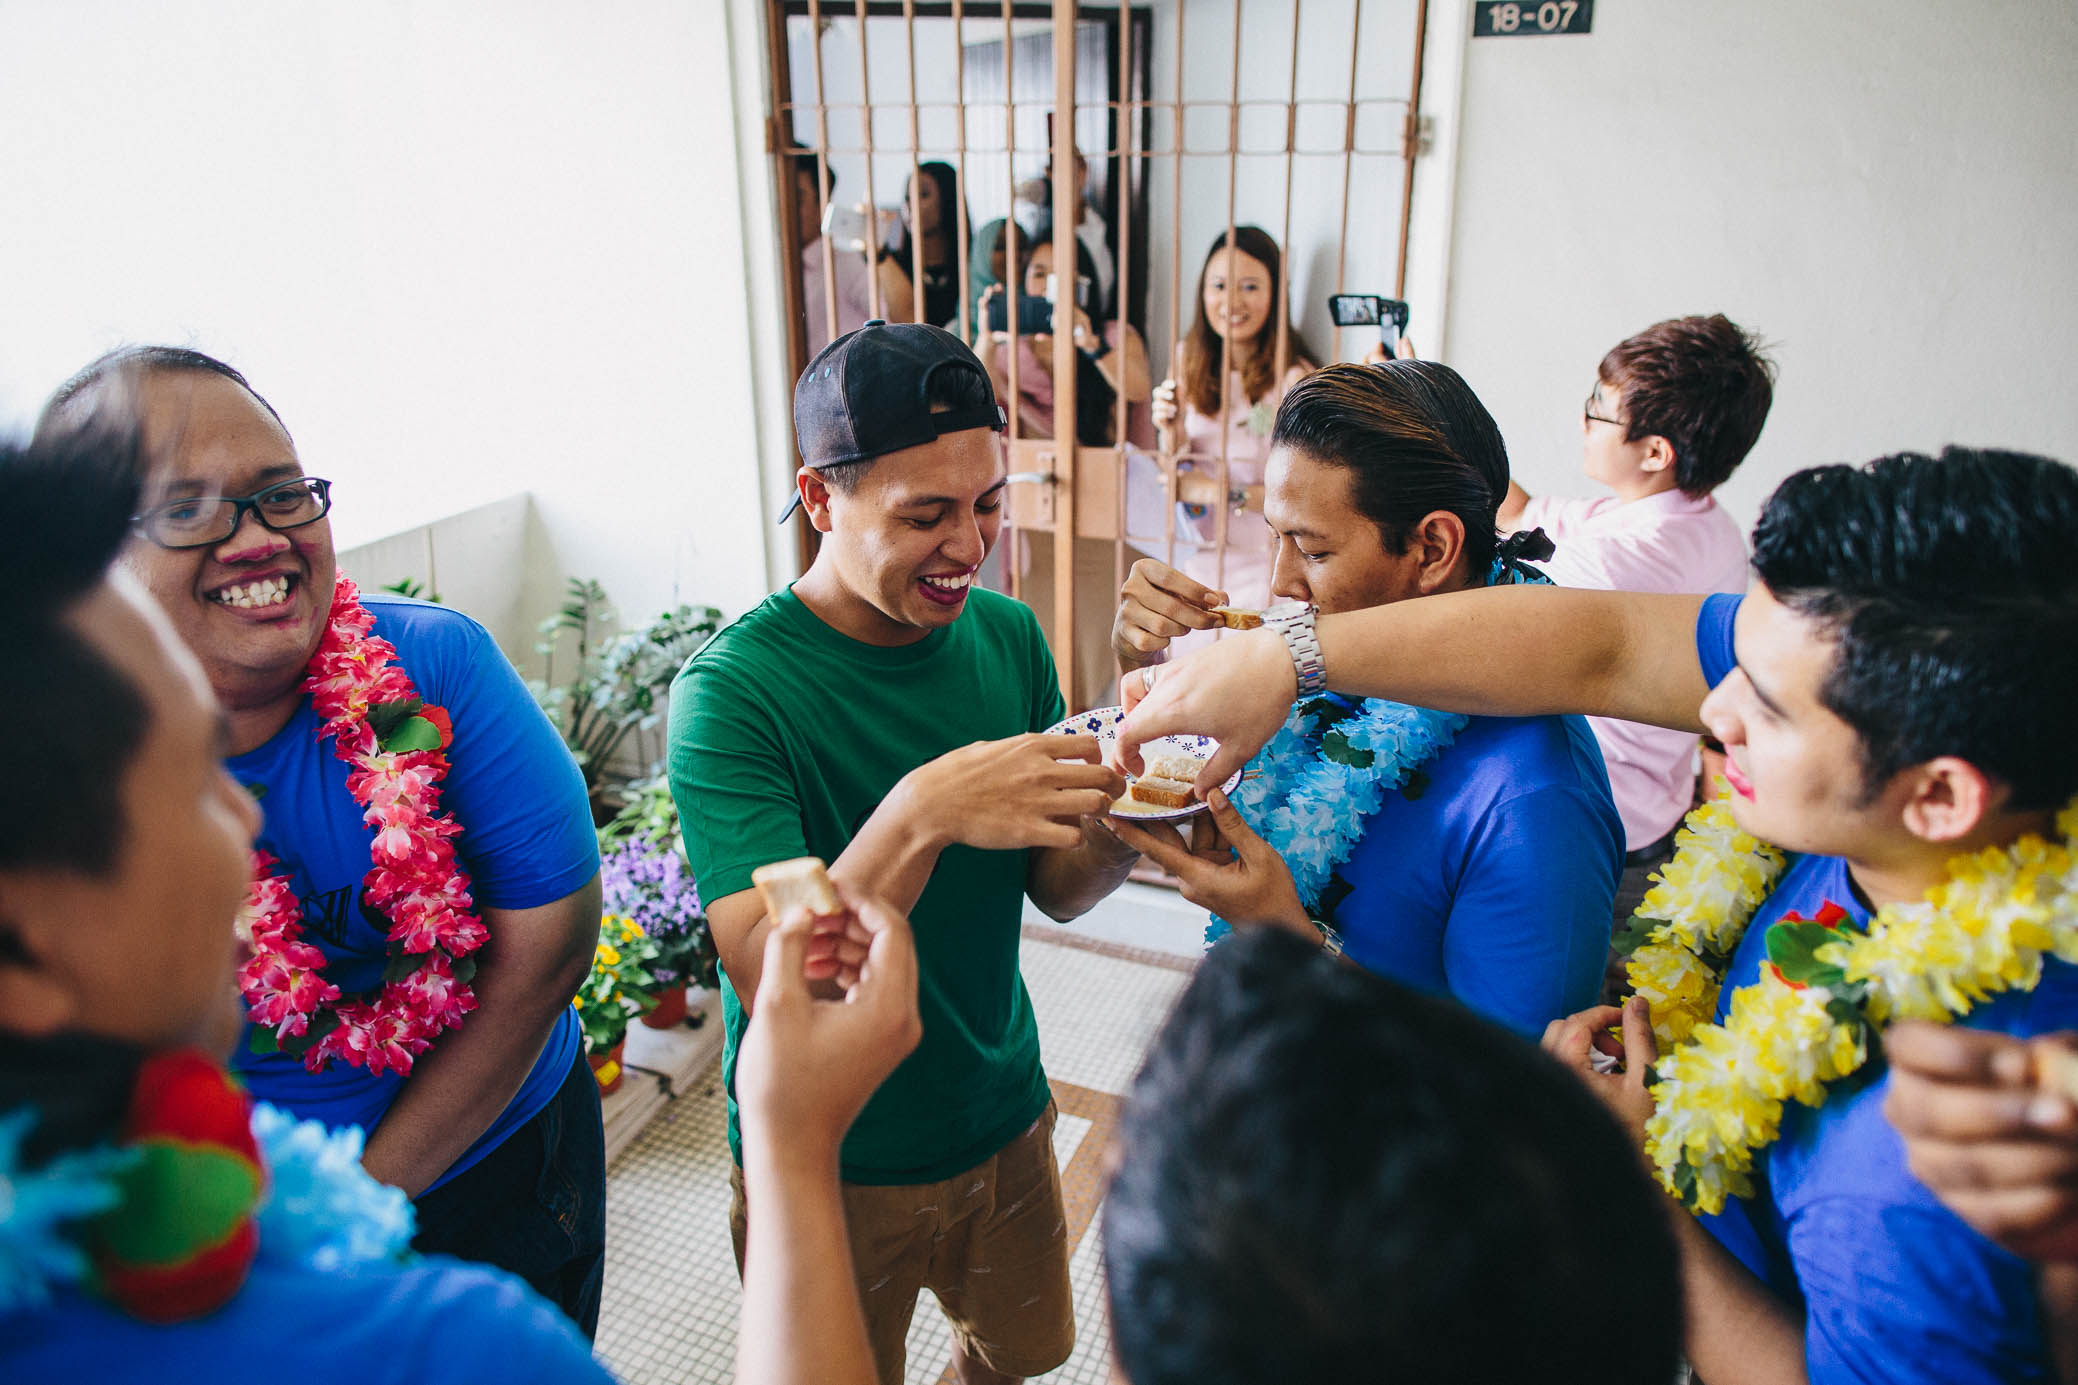 singapore-wedding-photographer-malay-indian-pre-wedding-travel-wmt-2015-alif-ethel-17.jpg